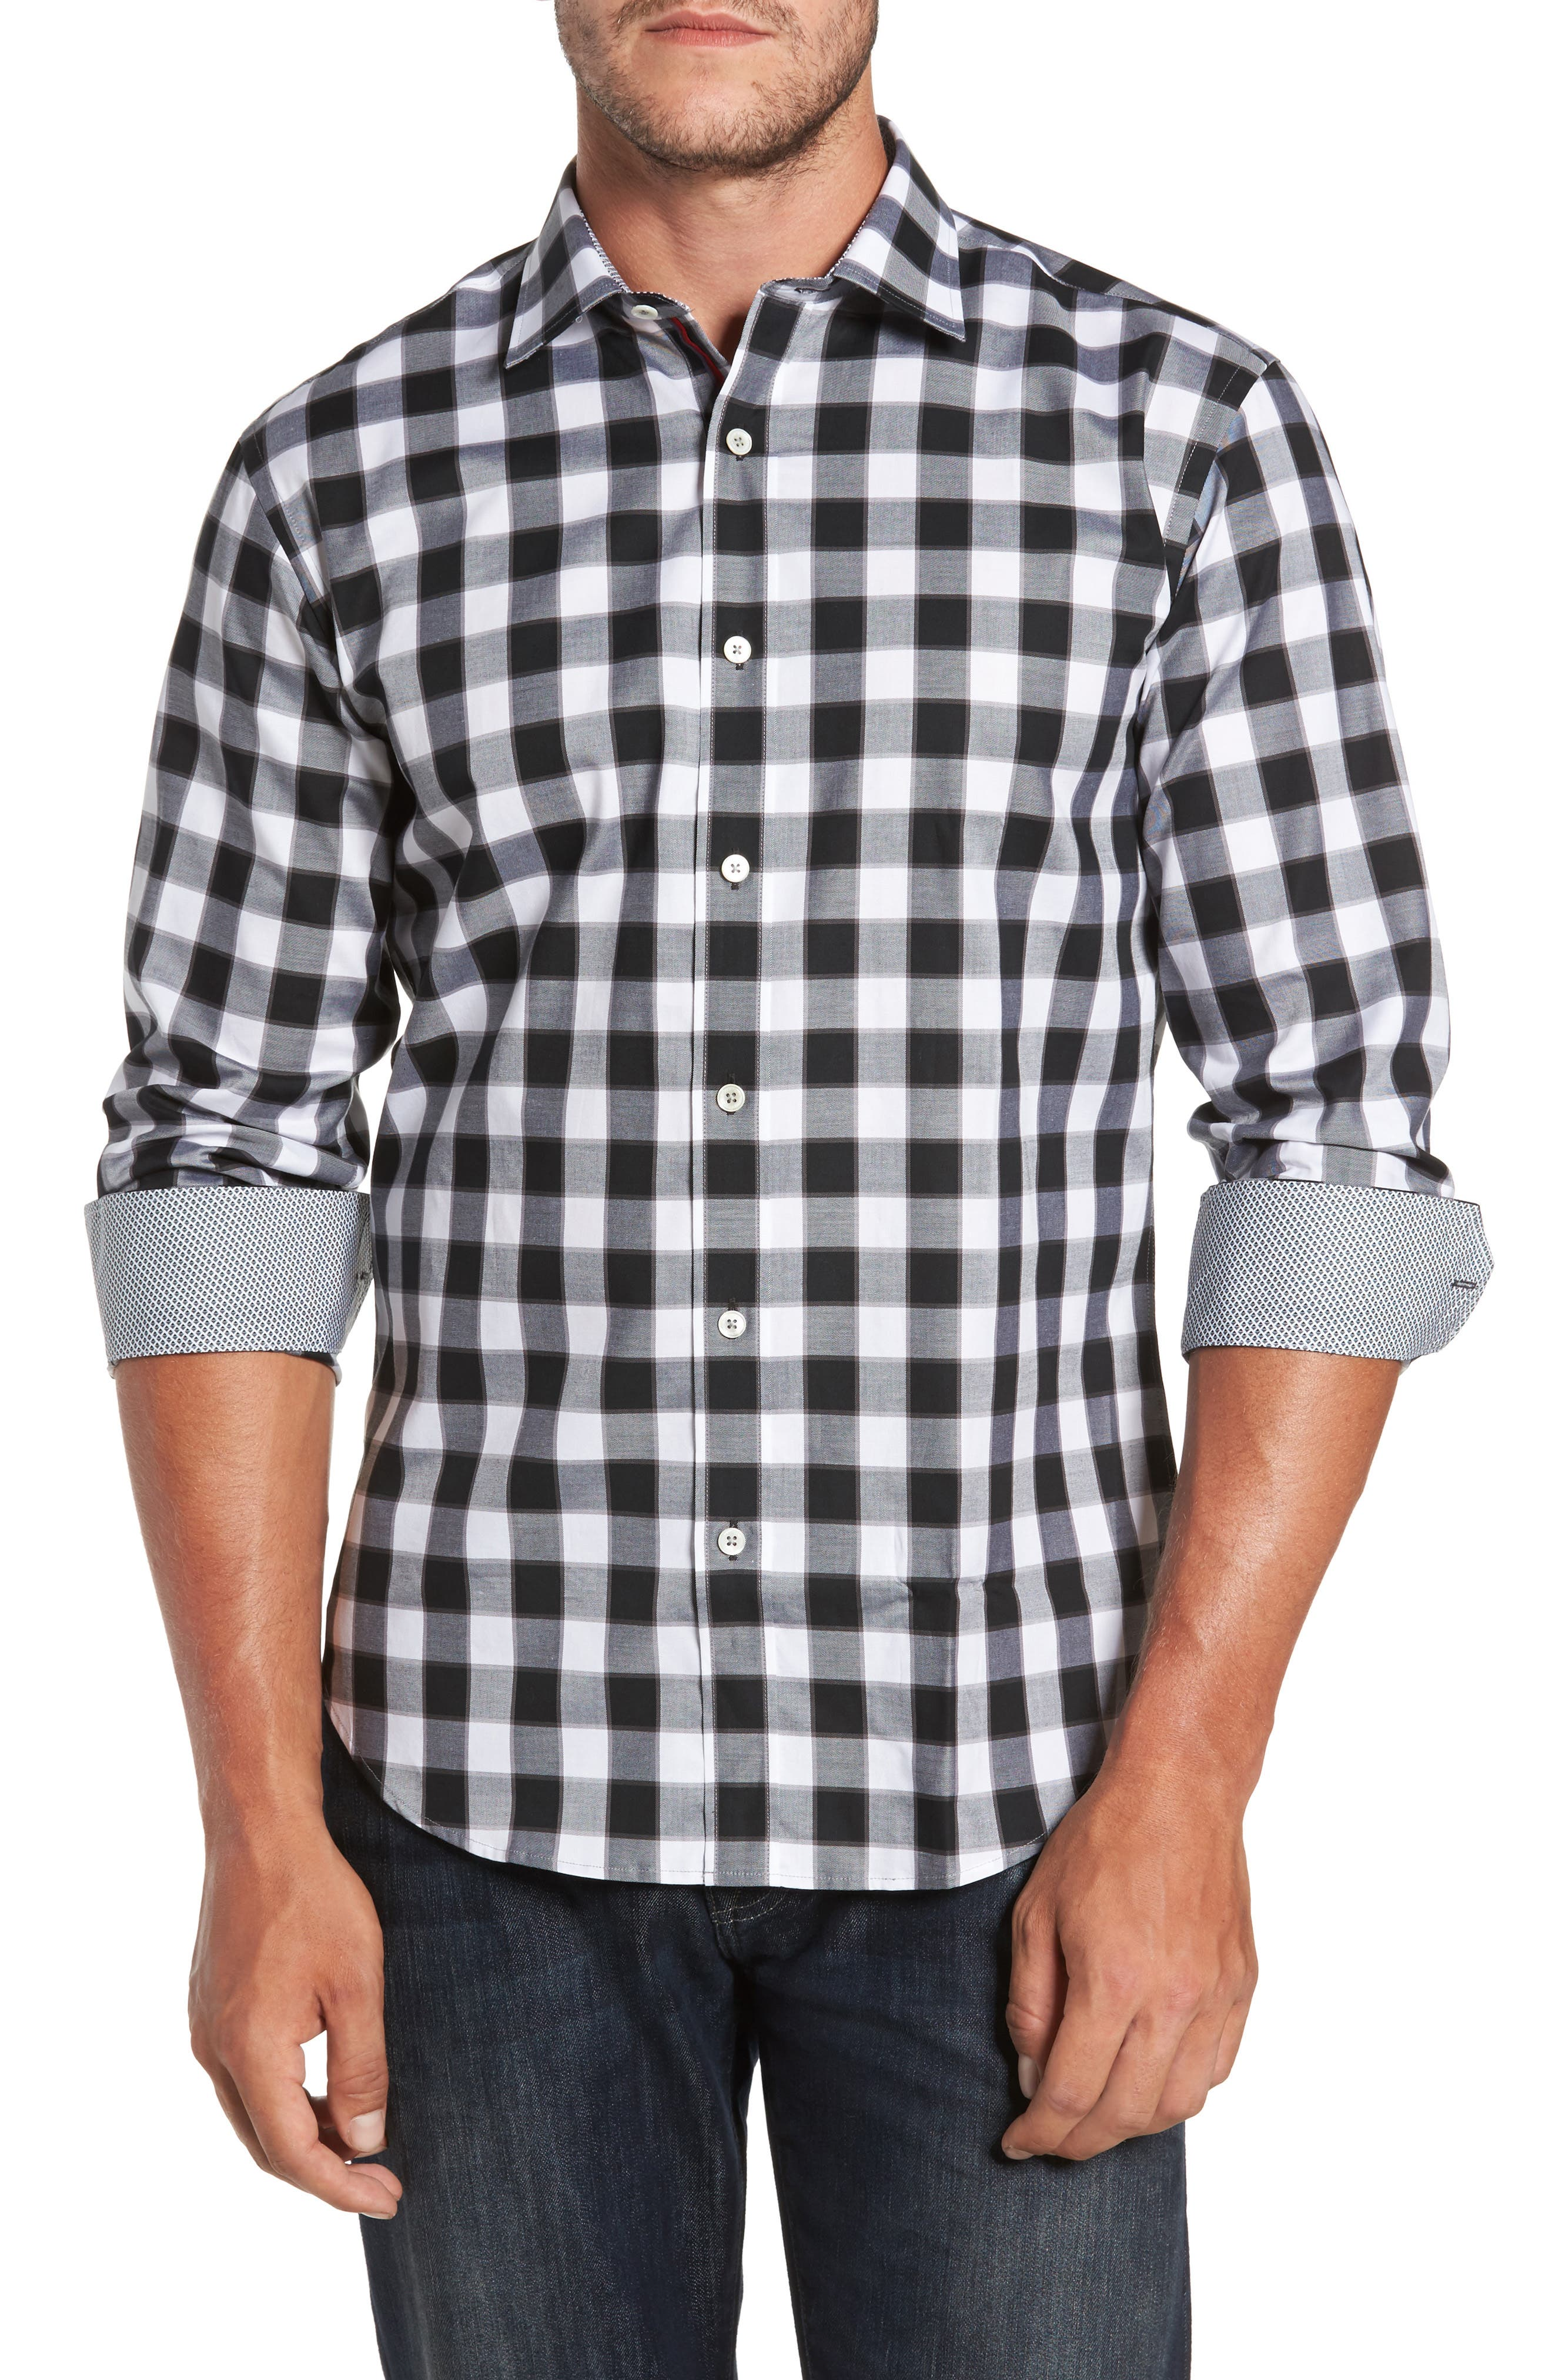 Alternate Image 1 Selected - Bugatchi Trim Fit Buffalo Plaid Sport Shirt